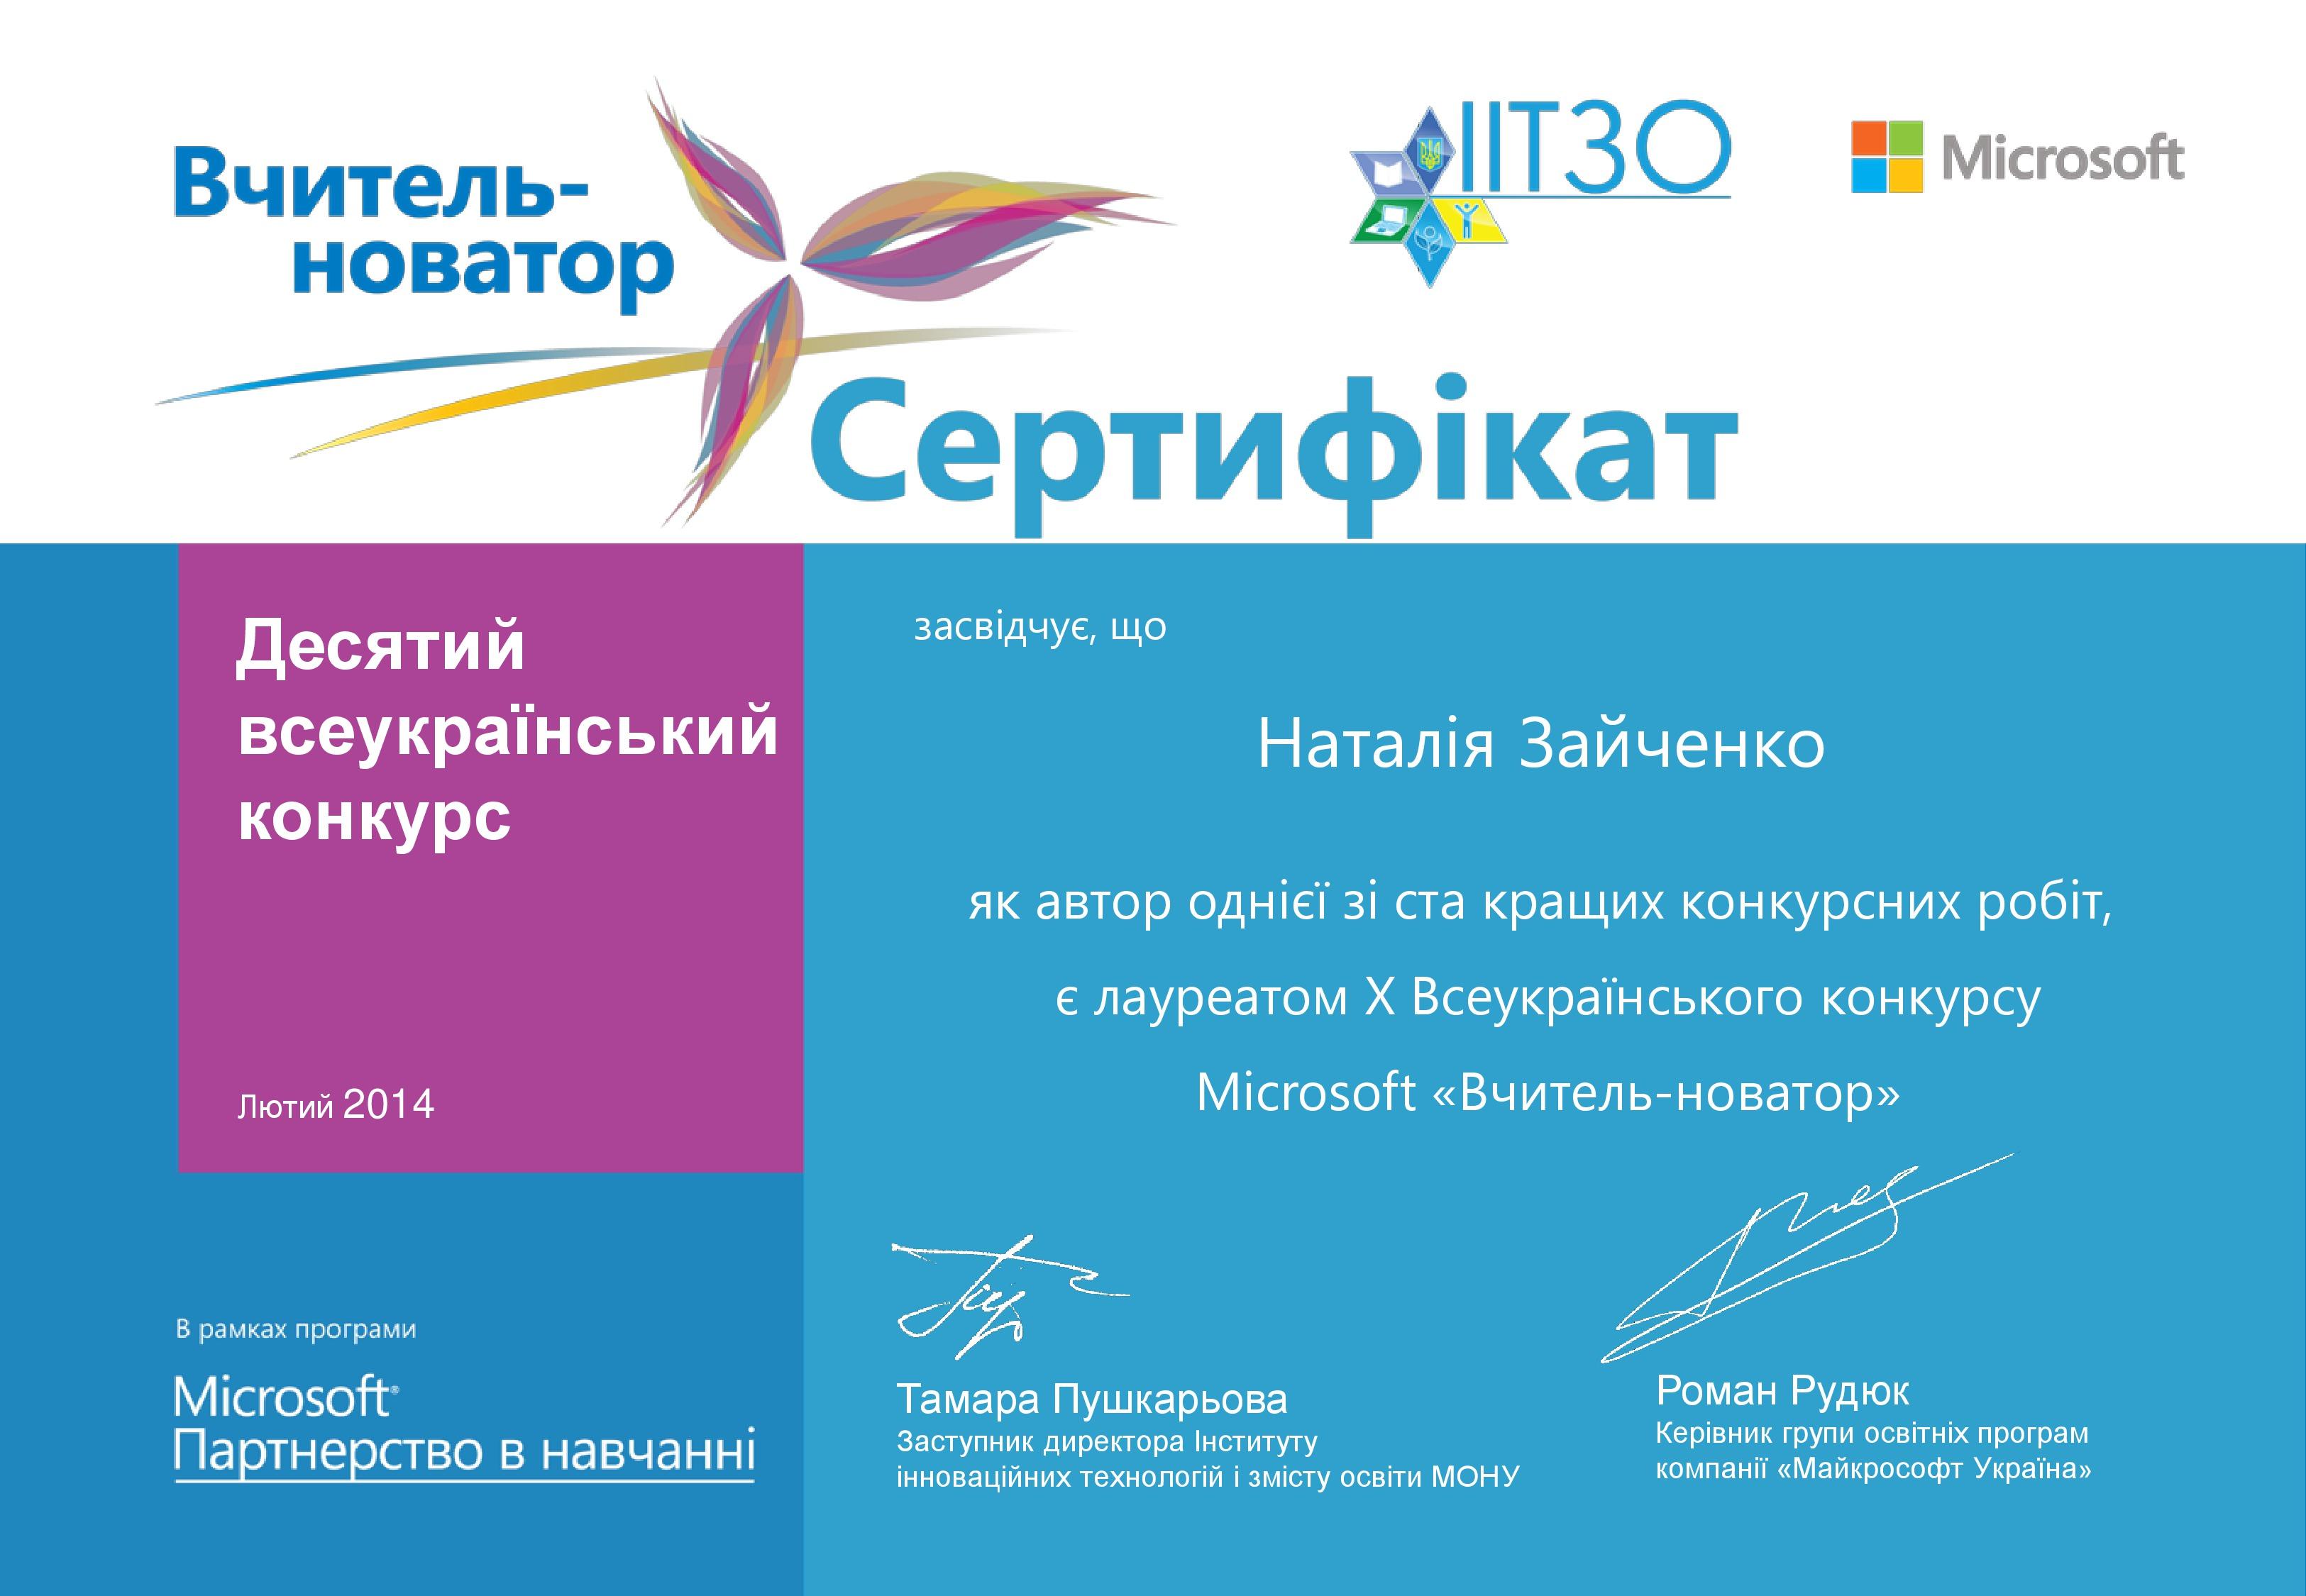 ViNXCertificate10Натал¦я Зайченко